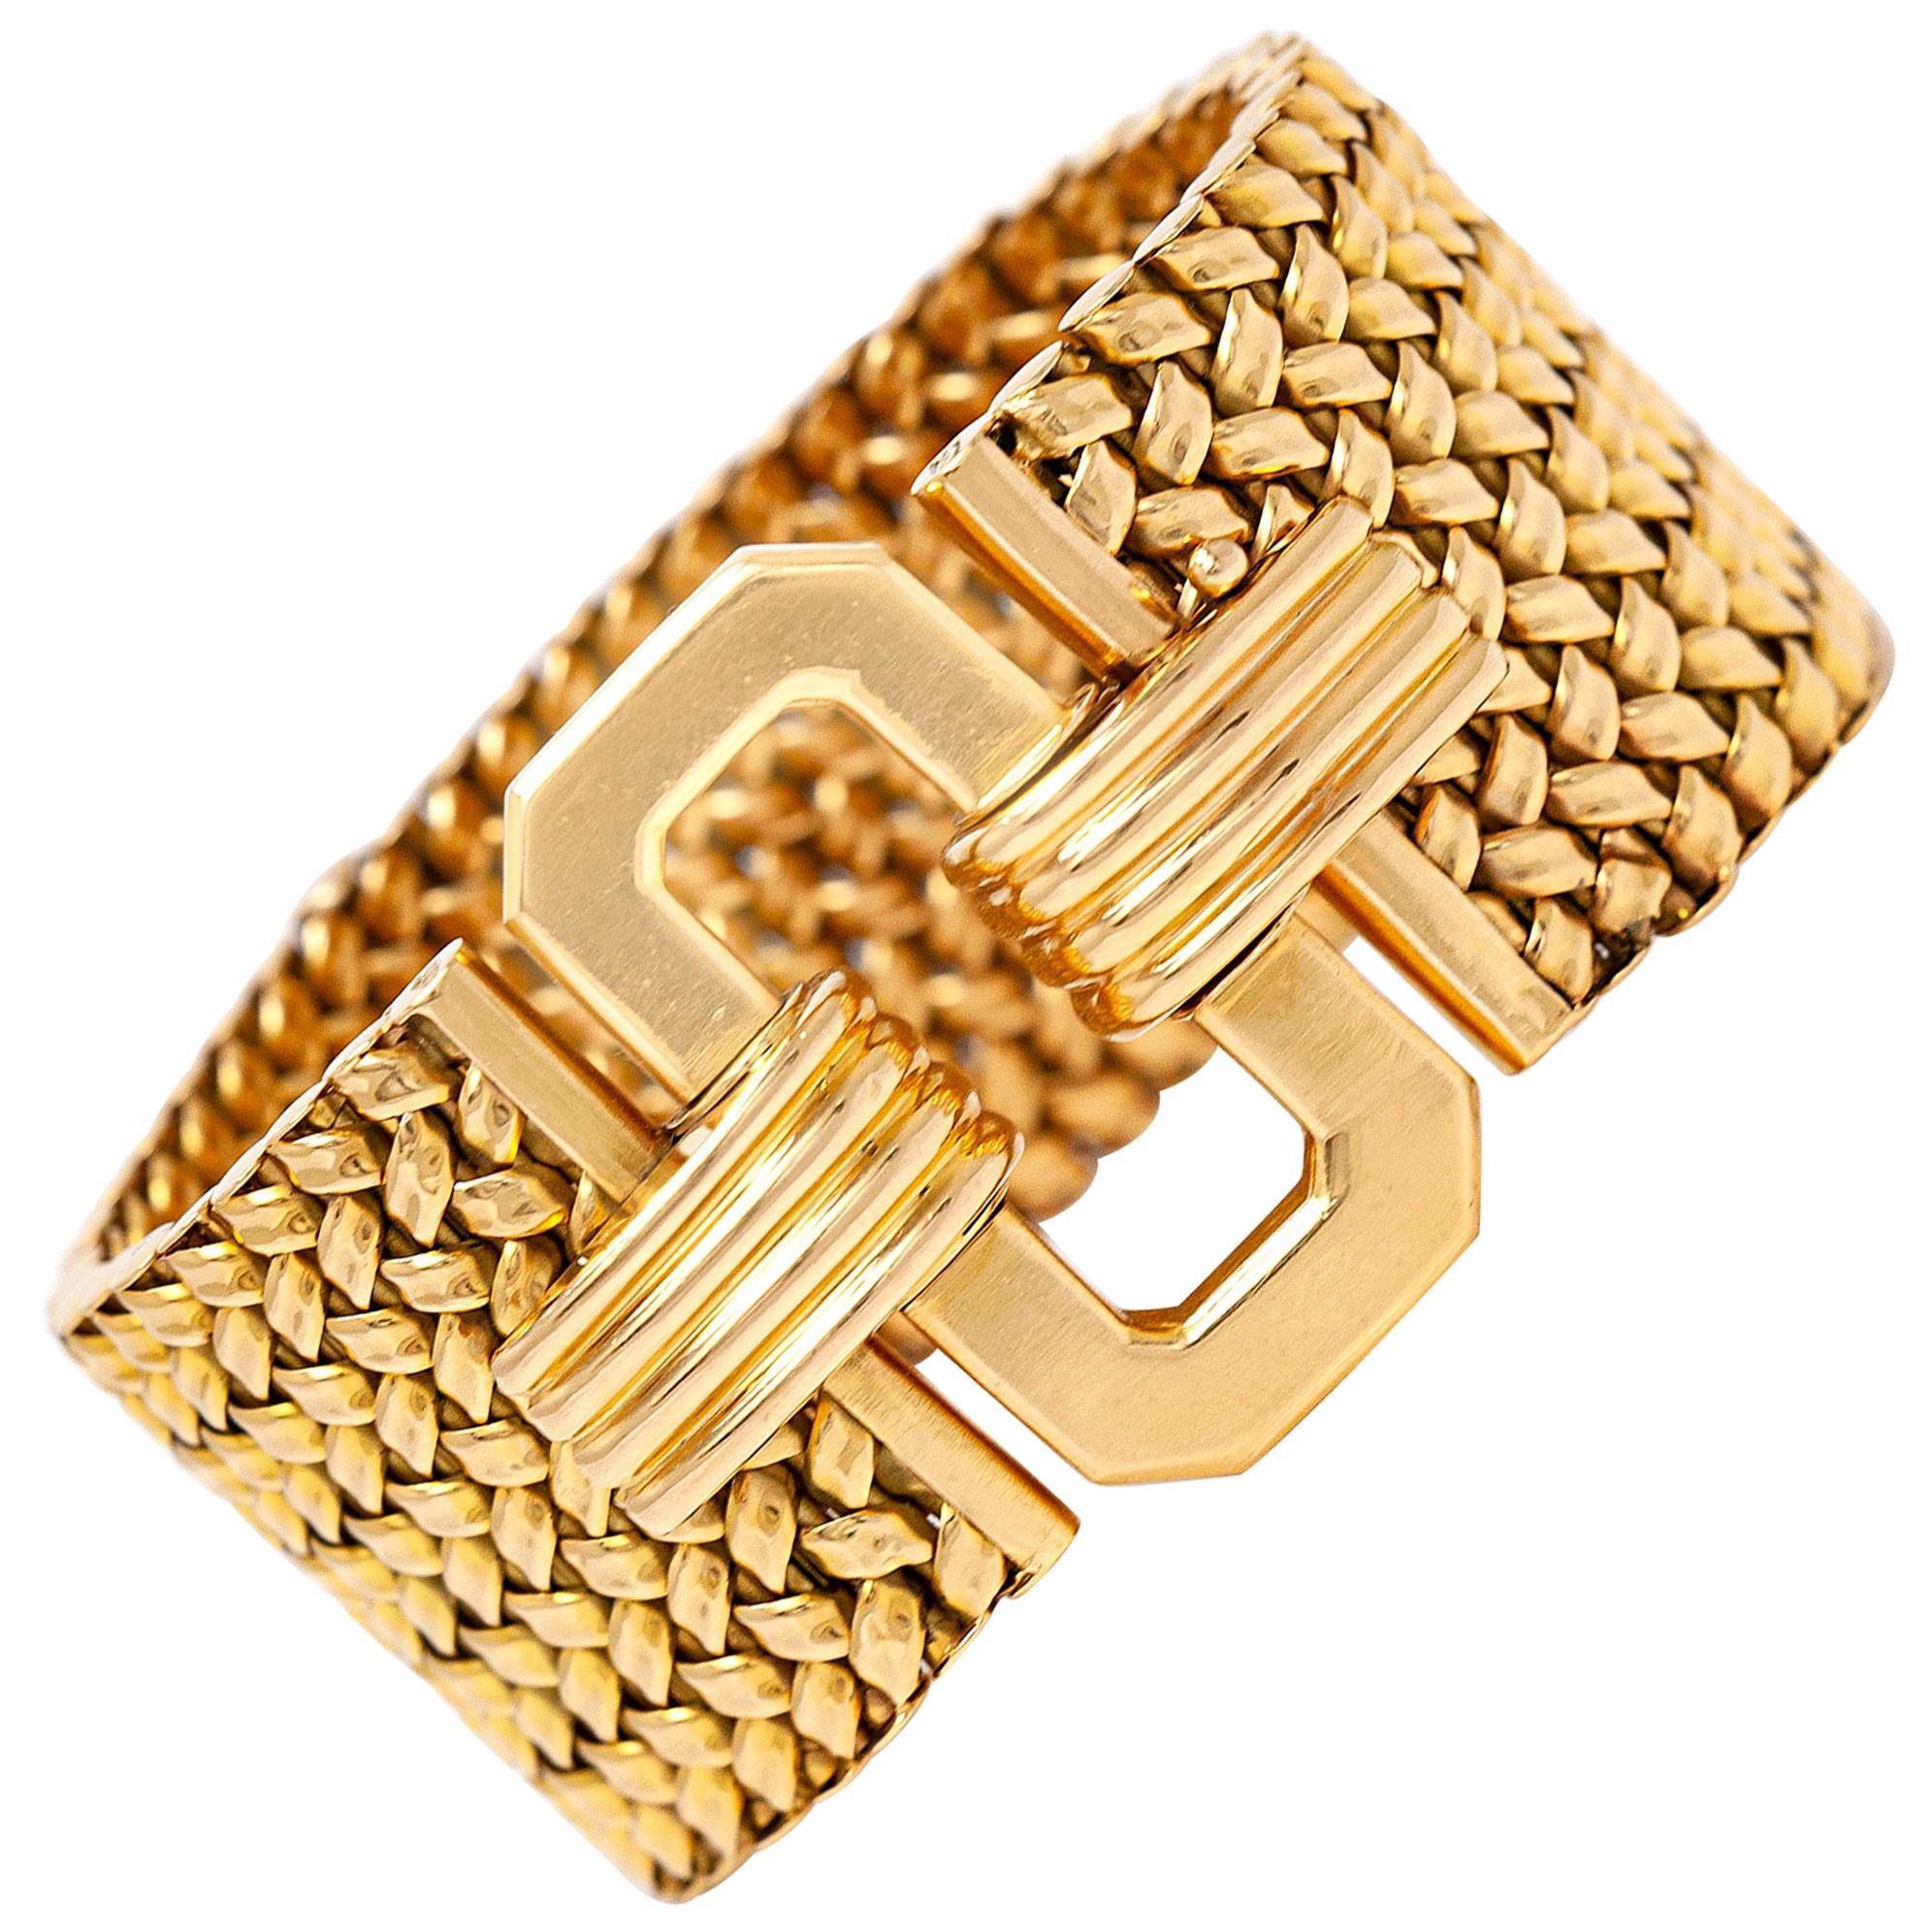 1960s Gold Buckle Bracelet